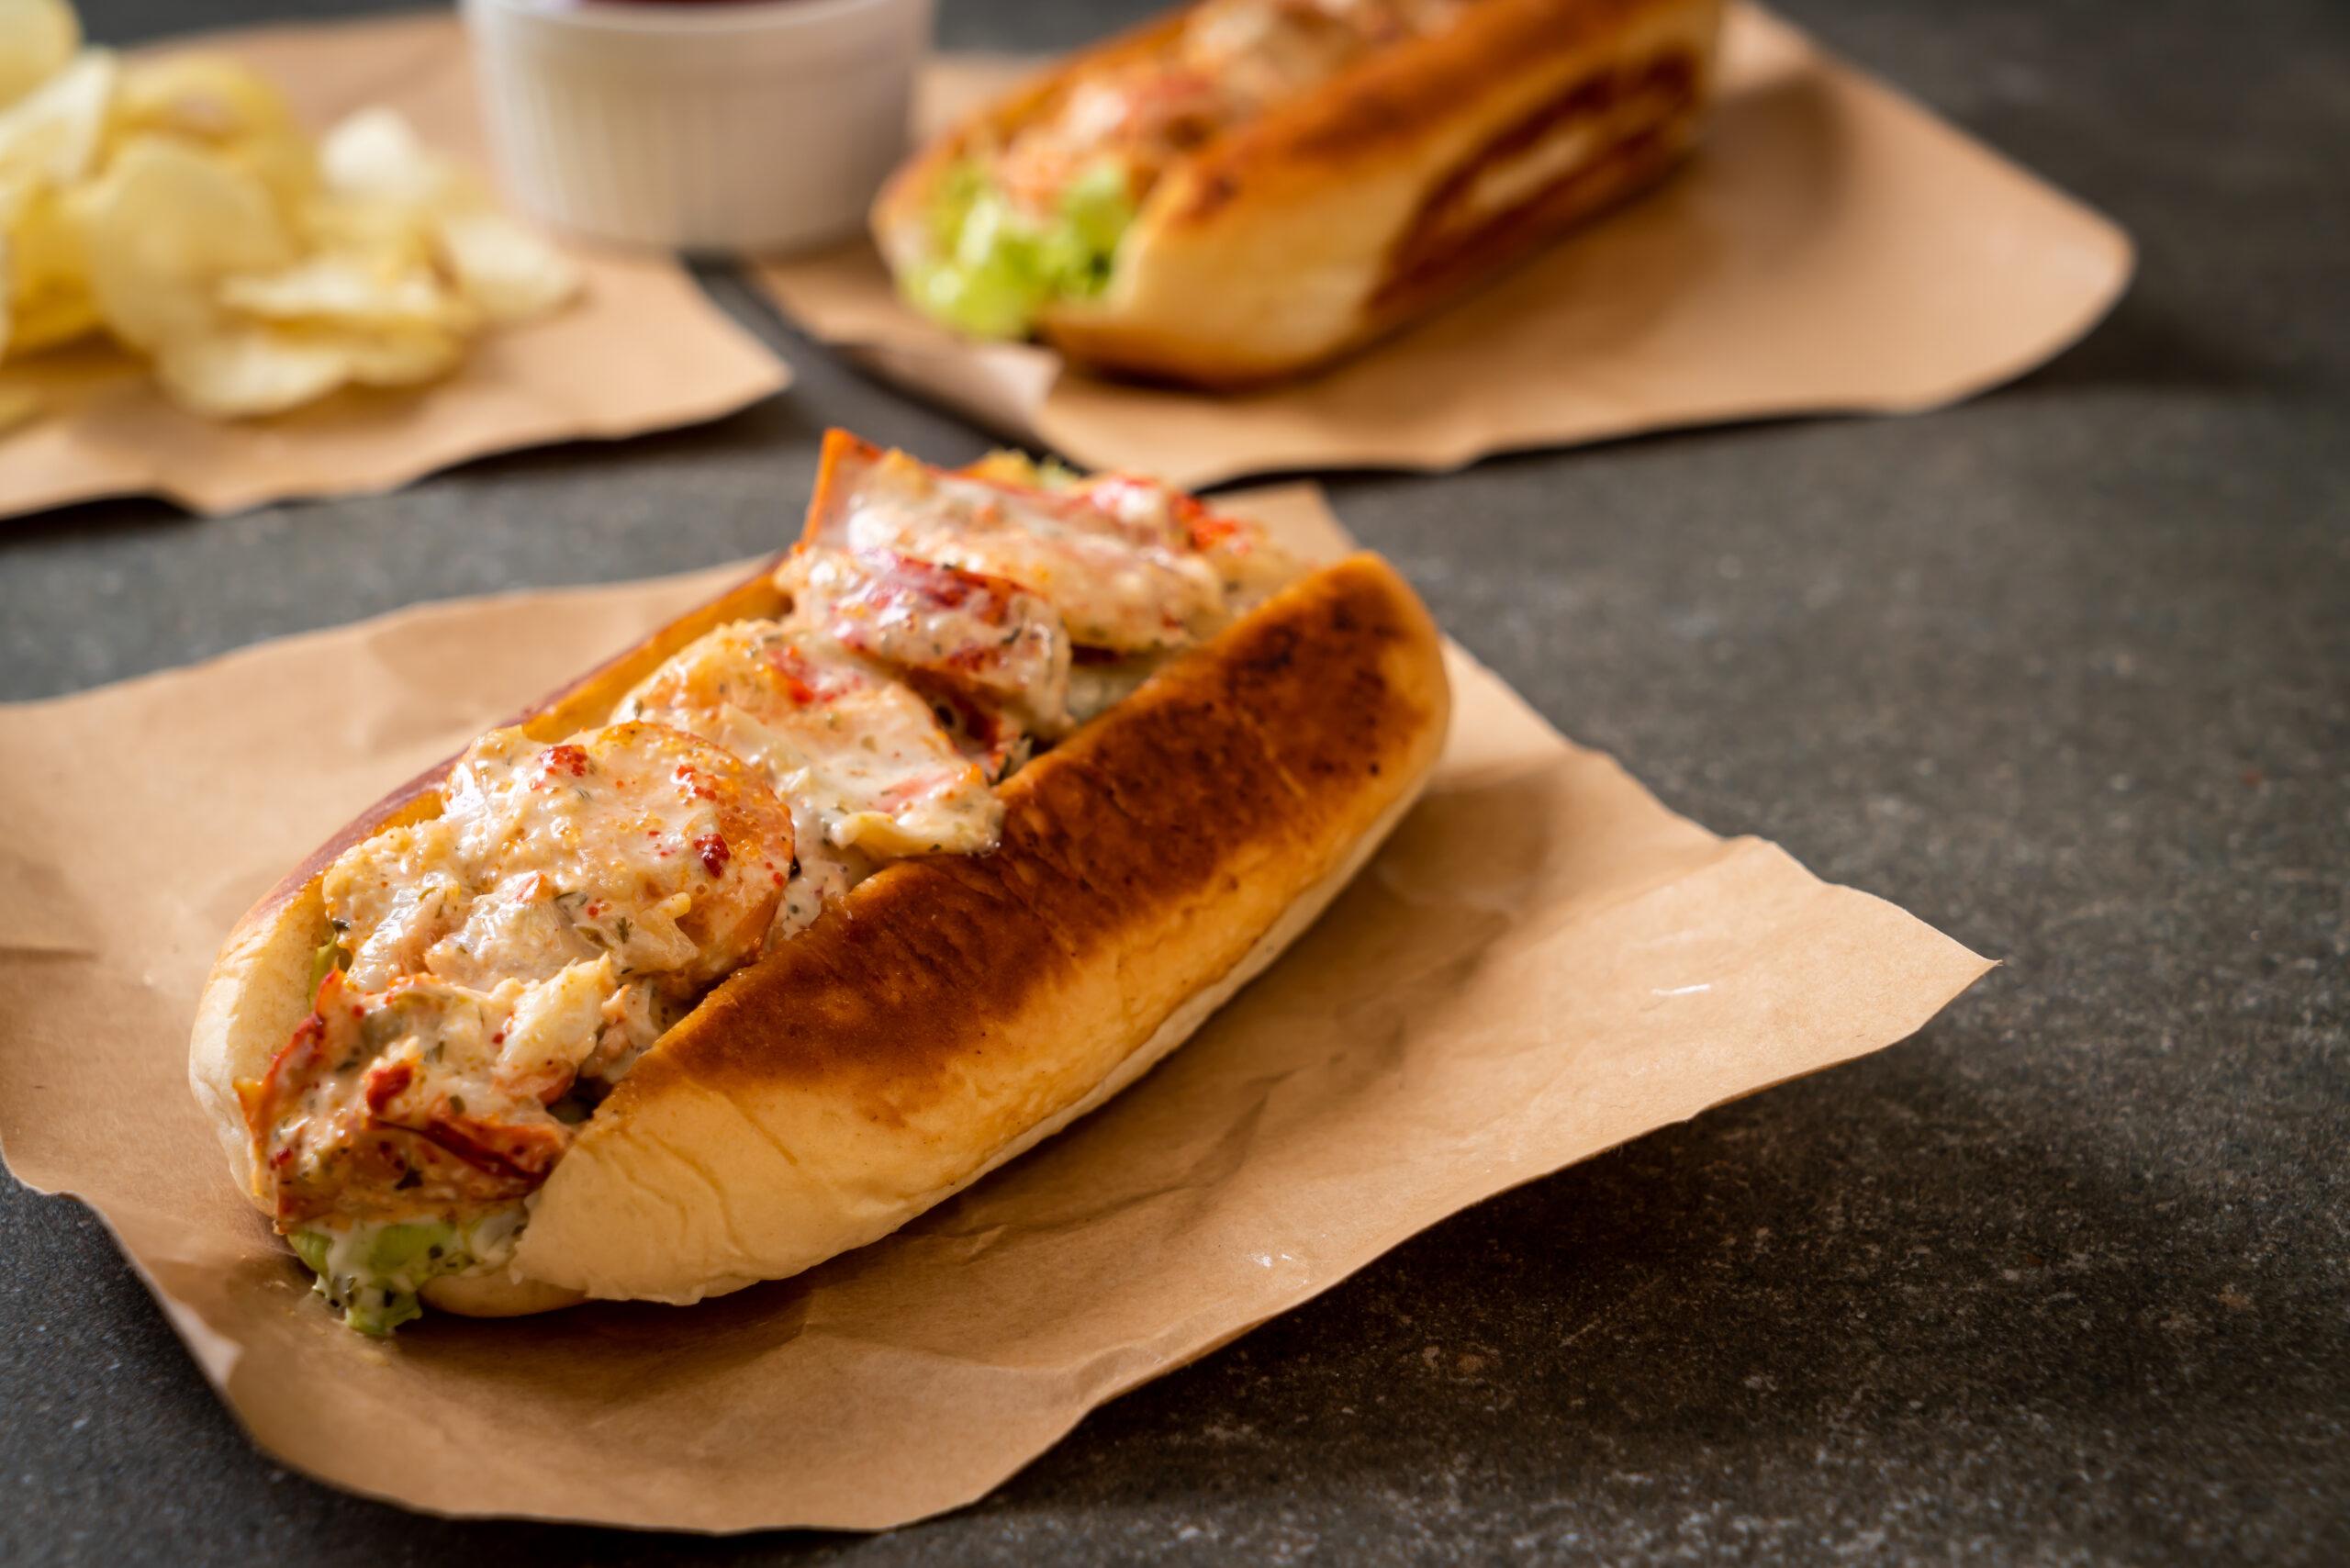 sandwich de marisco gallego con langosta